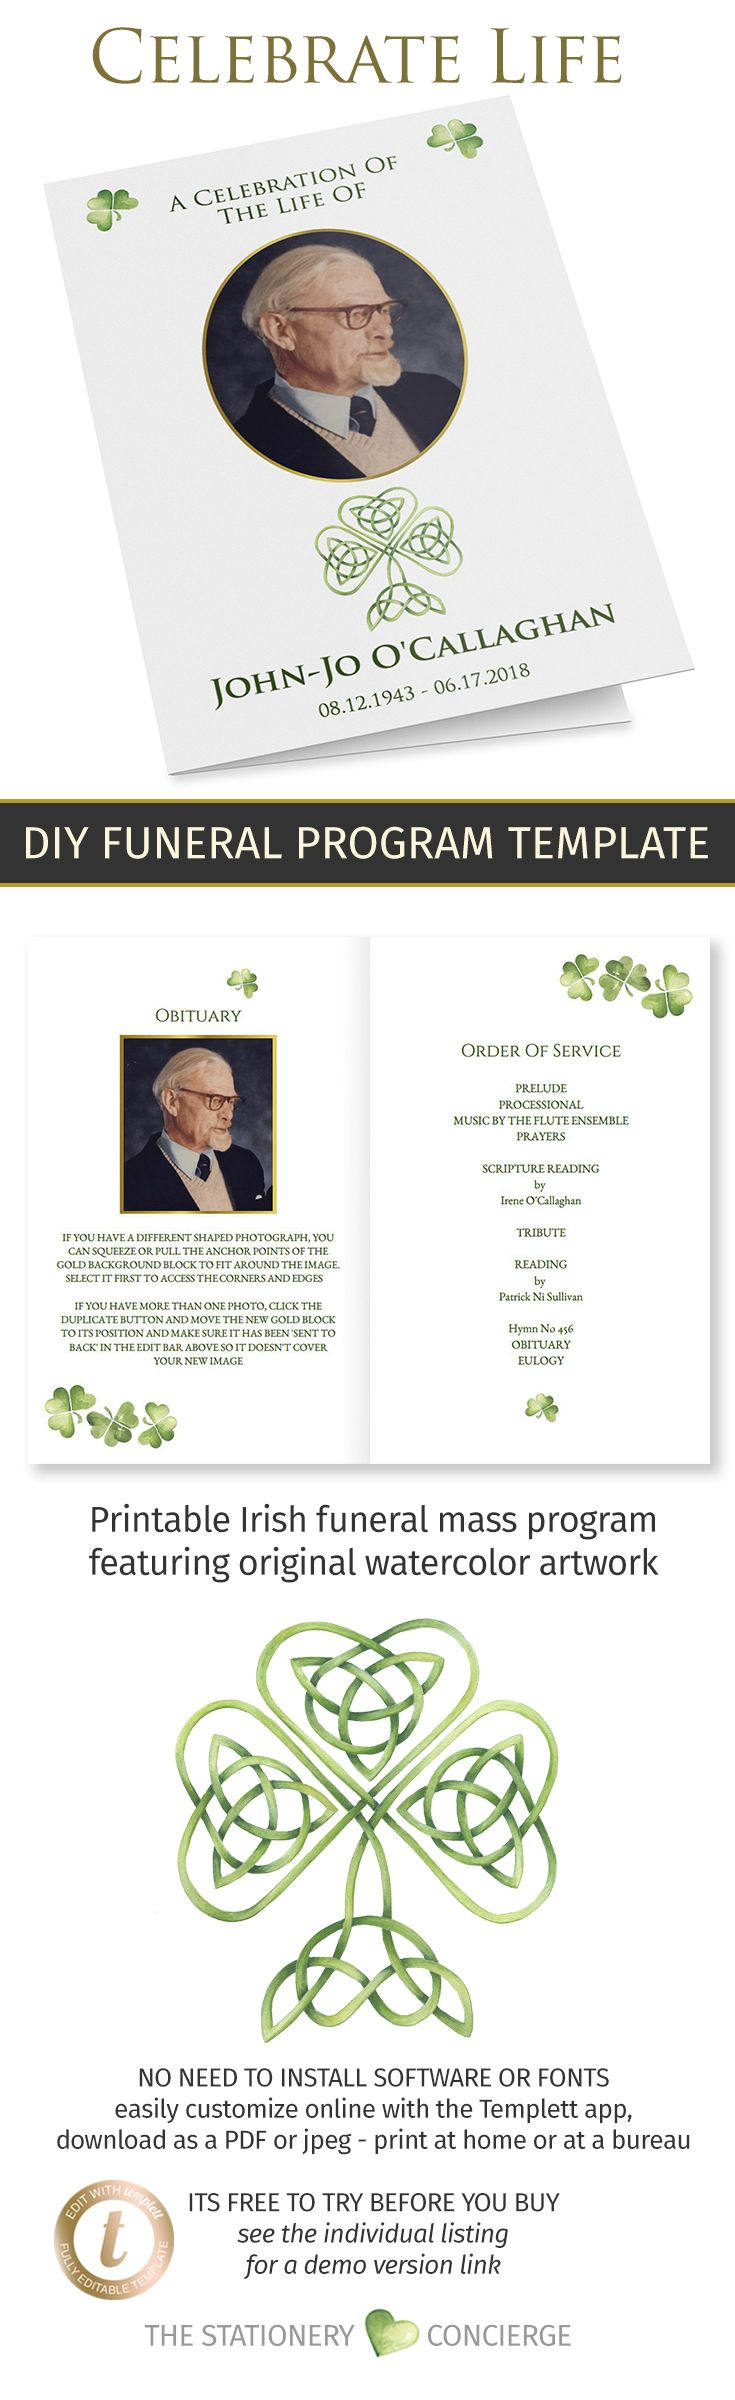 Irish Catholic Funeral Mass Program Template With Shamrocks And Gold